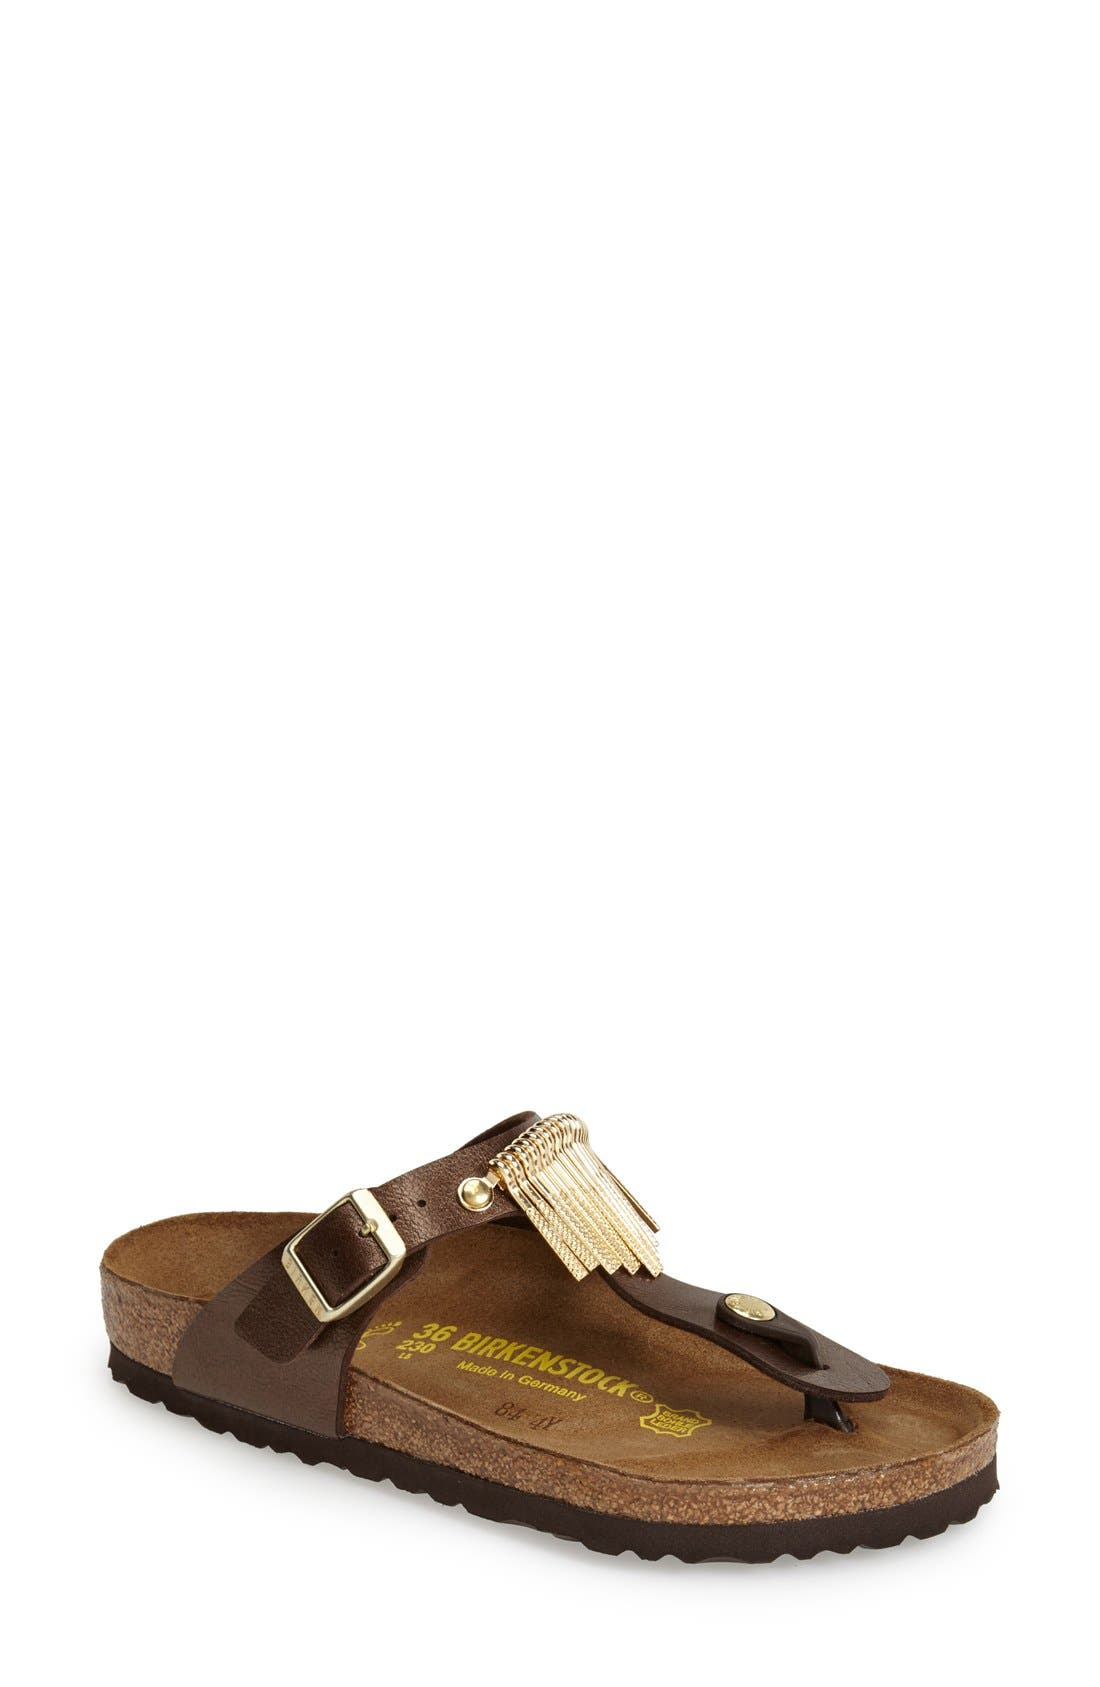 'Gizeh' Fringe Thong Sandal,                         Main,                         color, Toffee